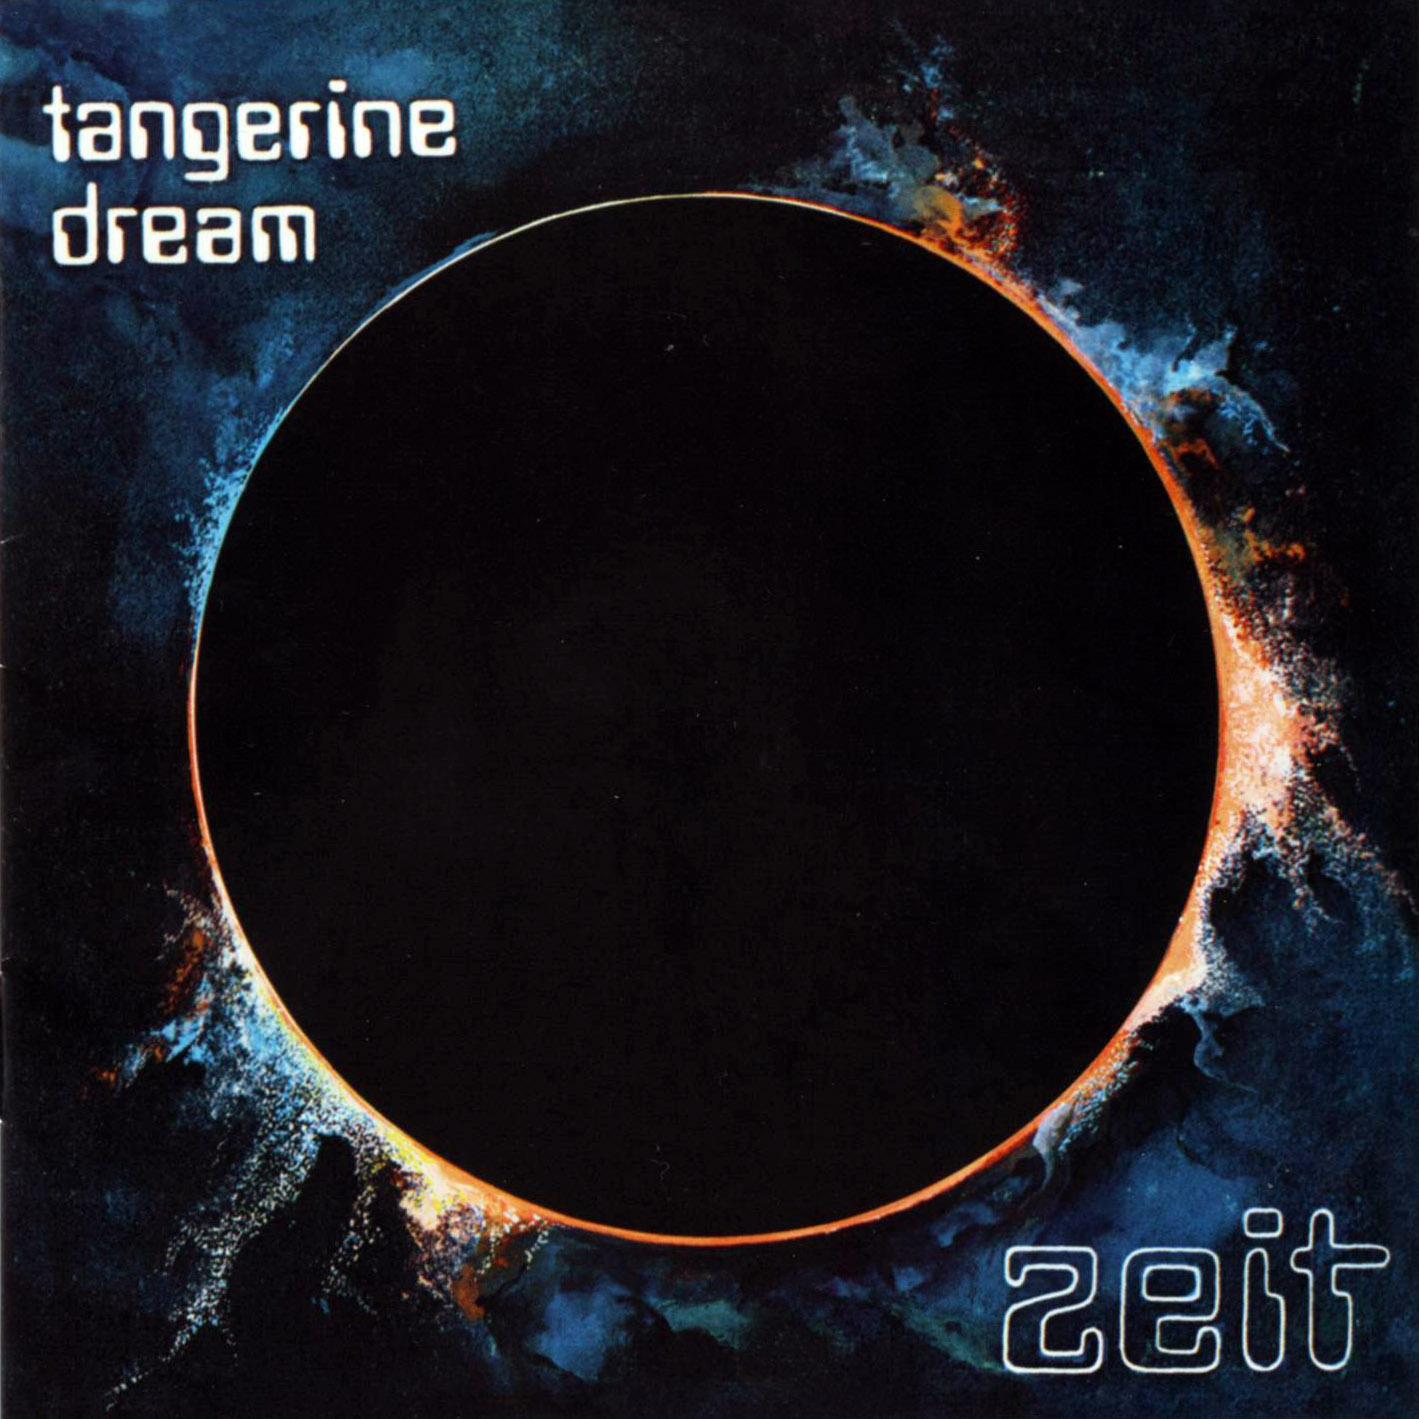 TangerineDream-Zeit-Front